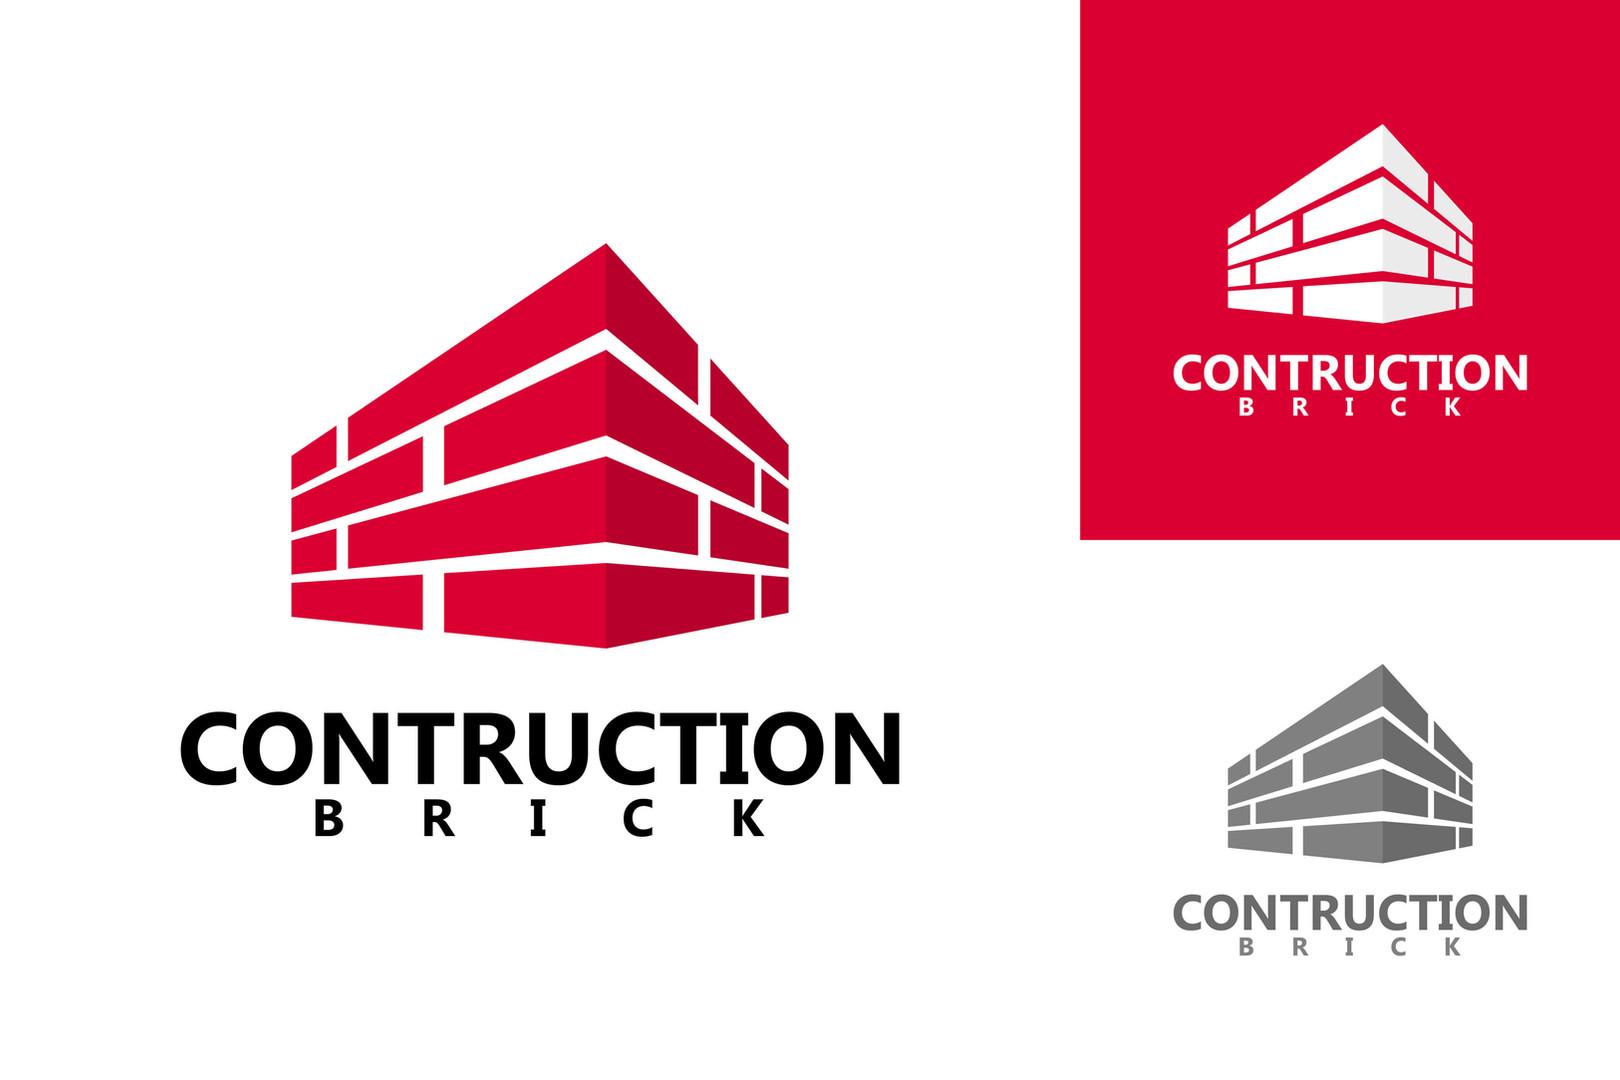 Construction Logo Samples - Imageflow